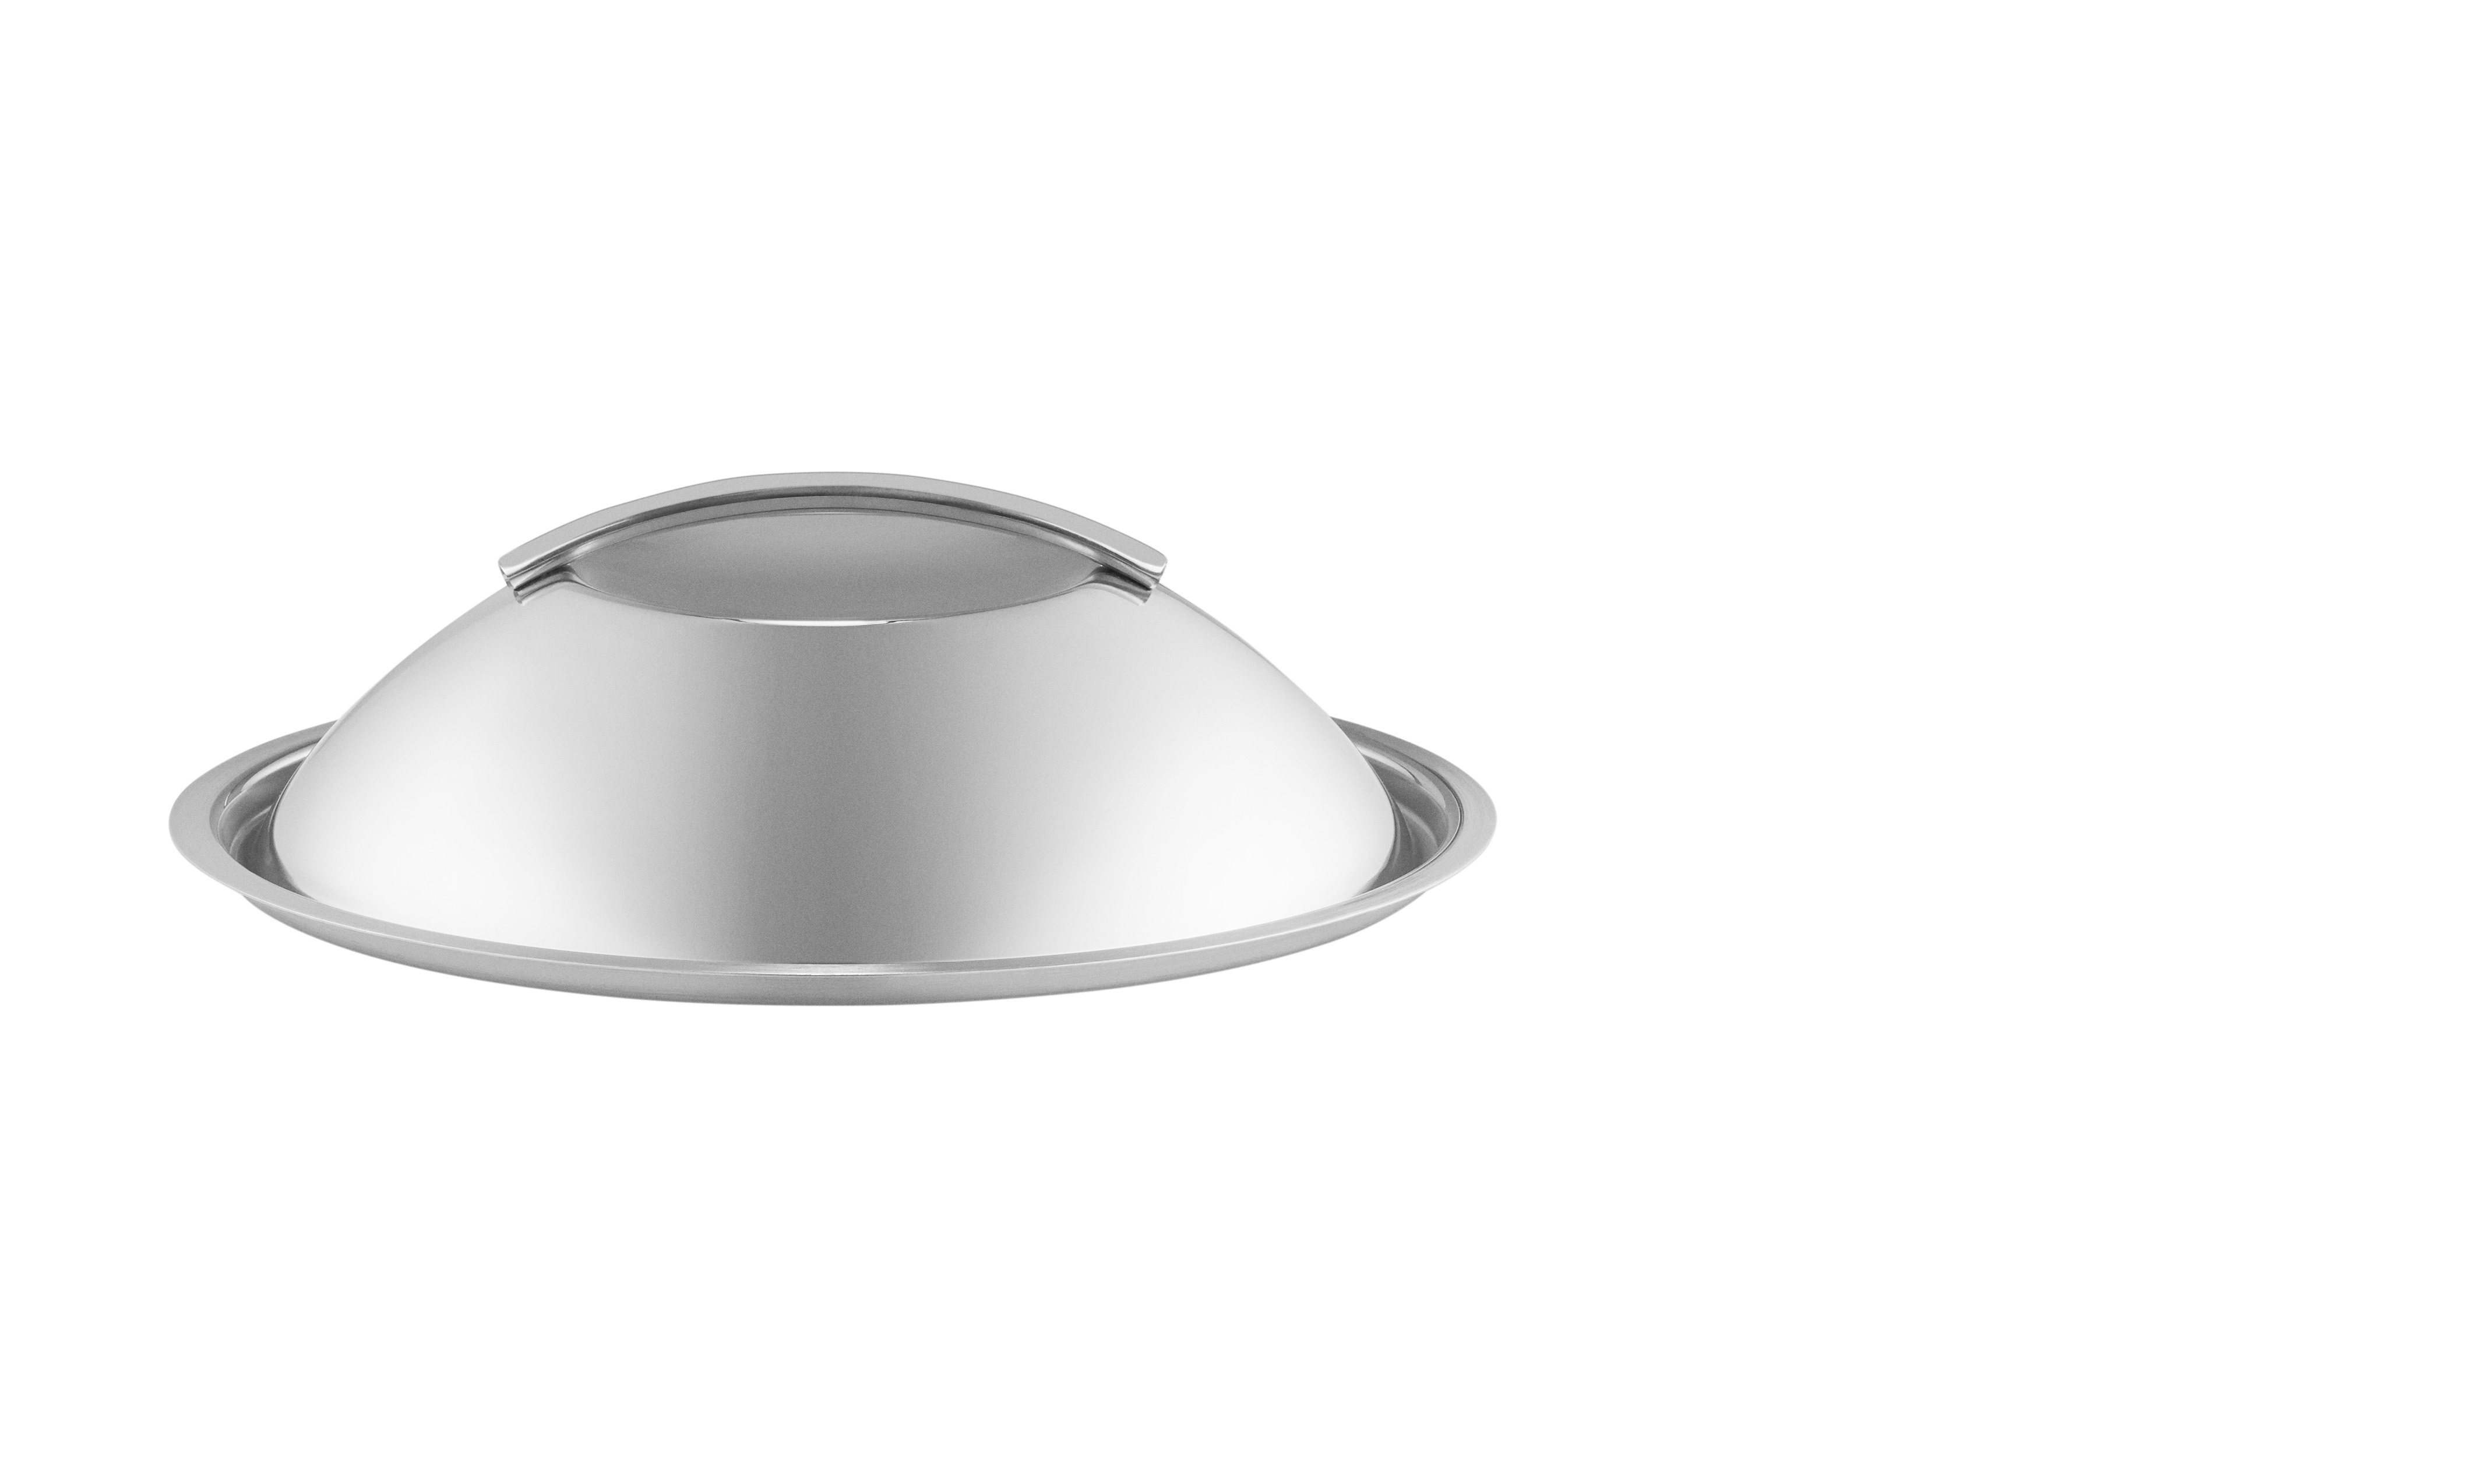 Eva Trio - Dome Lid - 24 cm (206064)